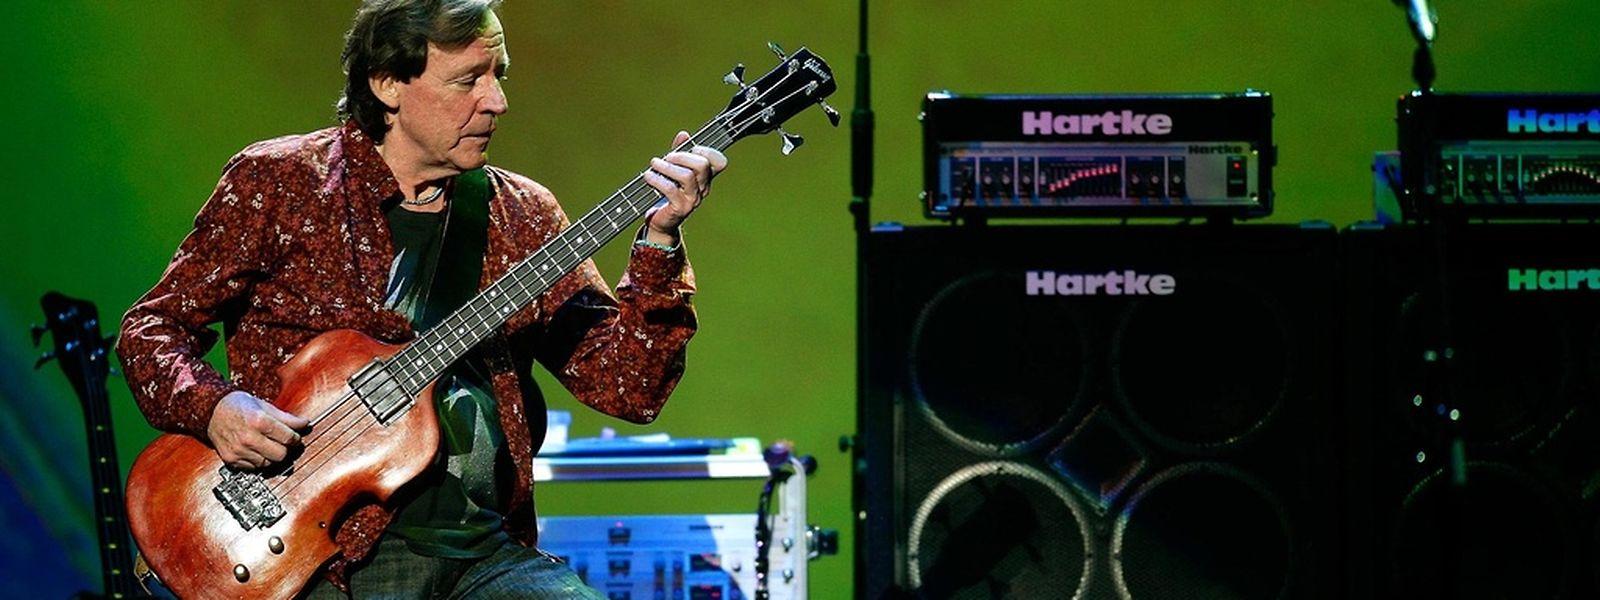 Jack Bruce 2005 im Royal Albert Hall in London.